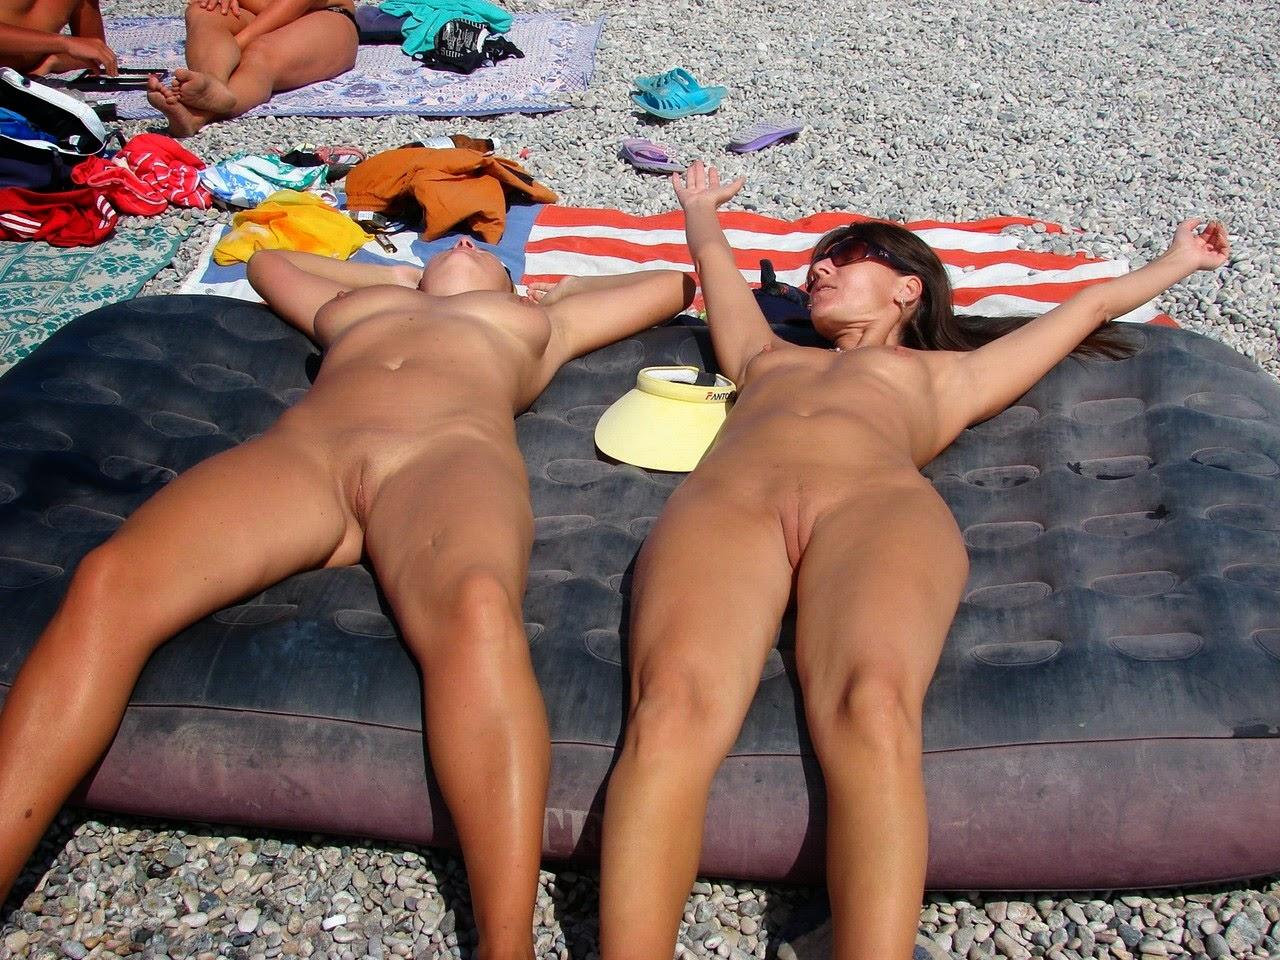 Something Spread nudist moms logically